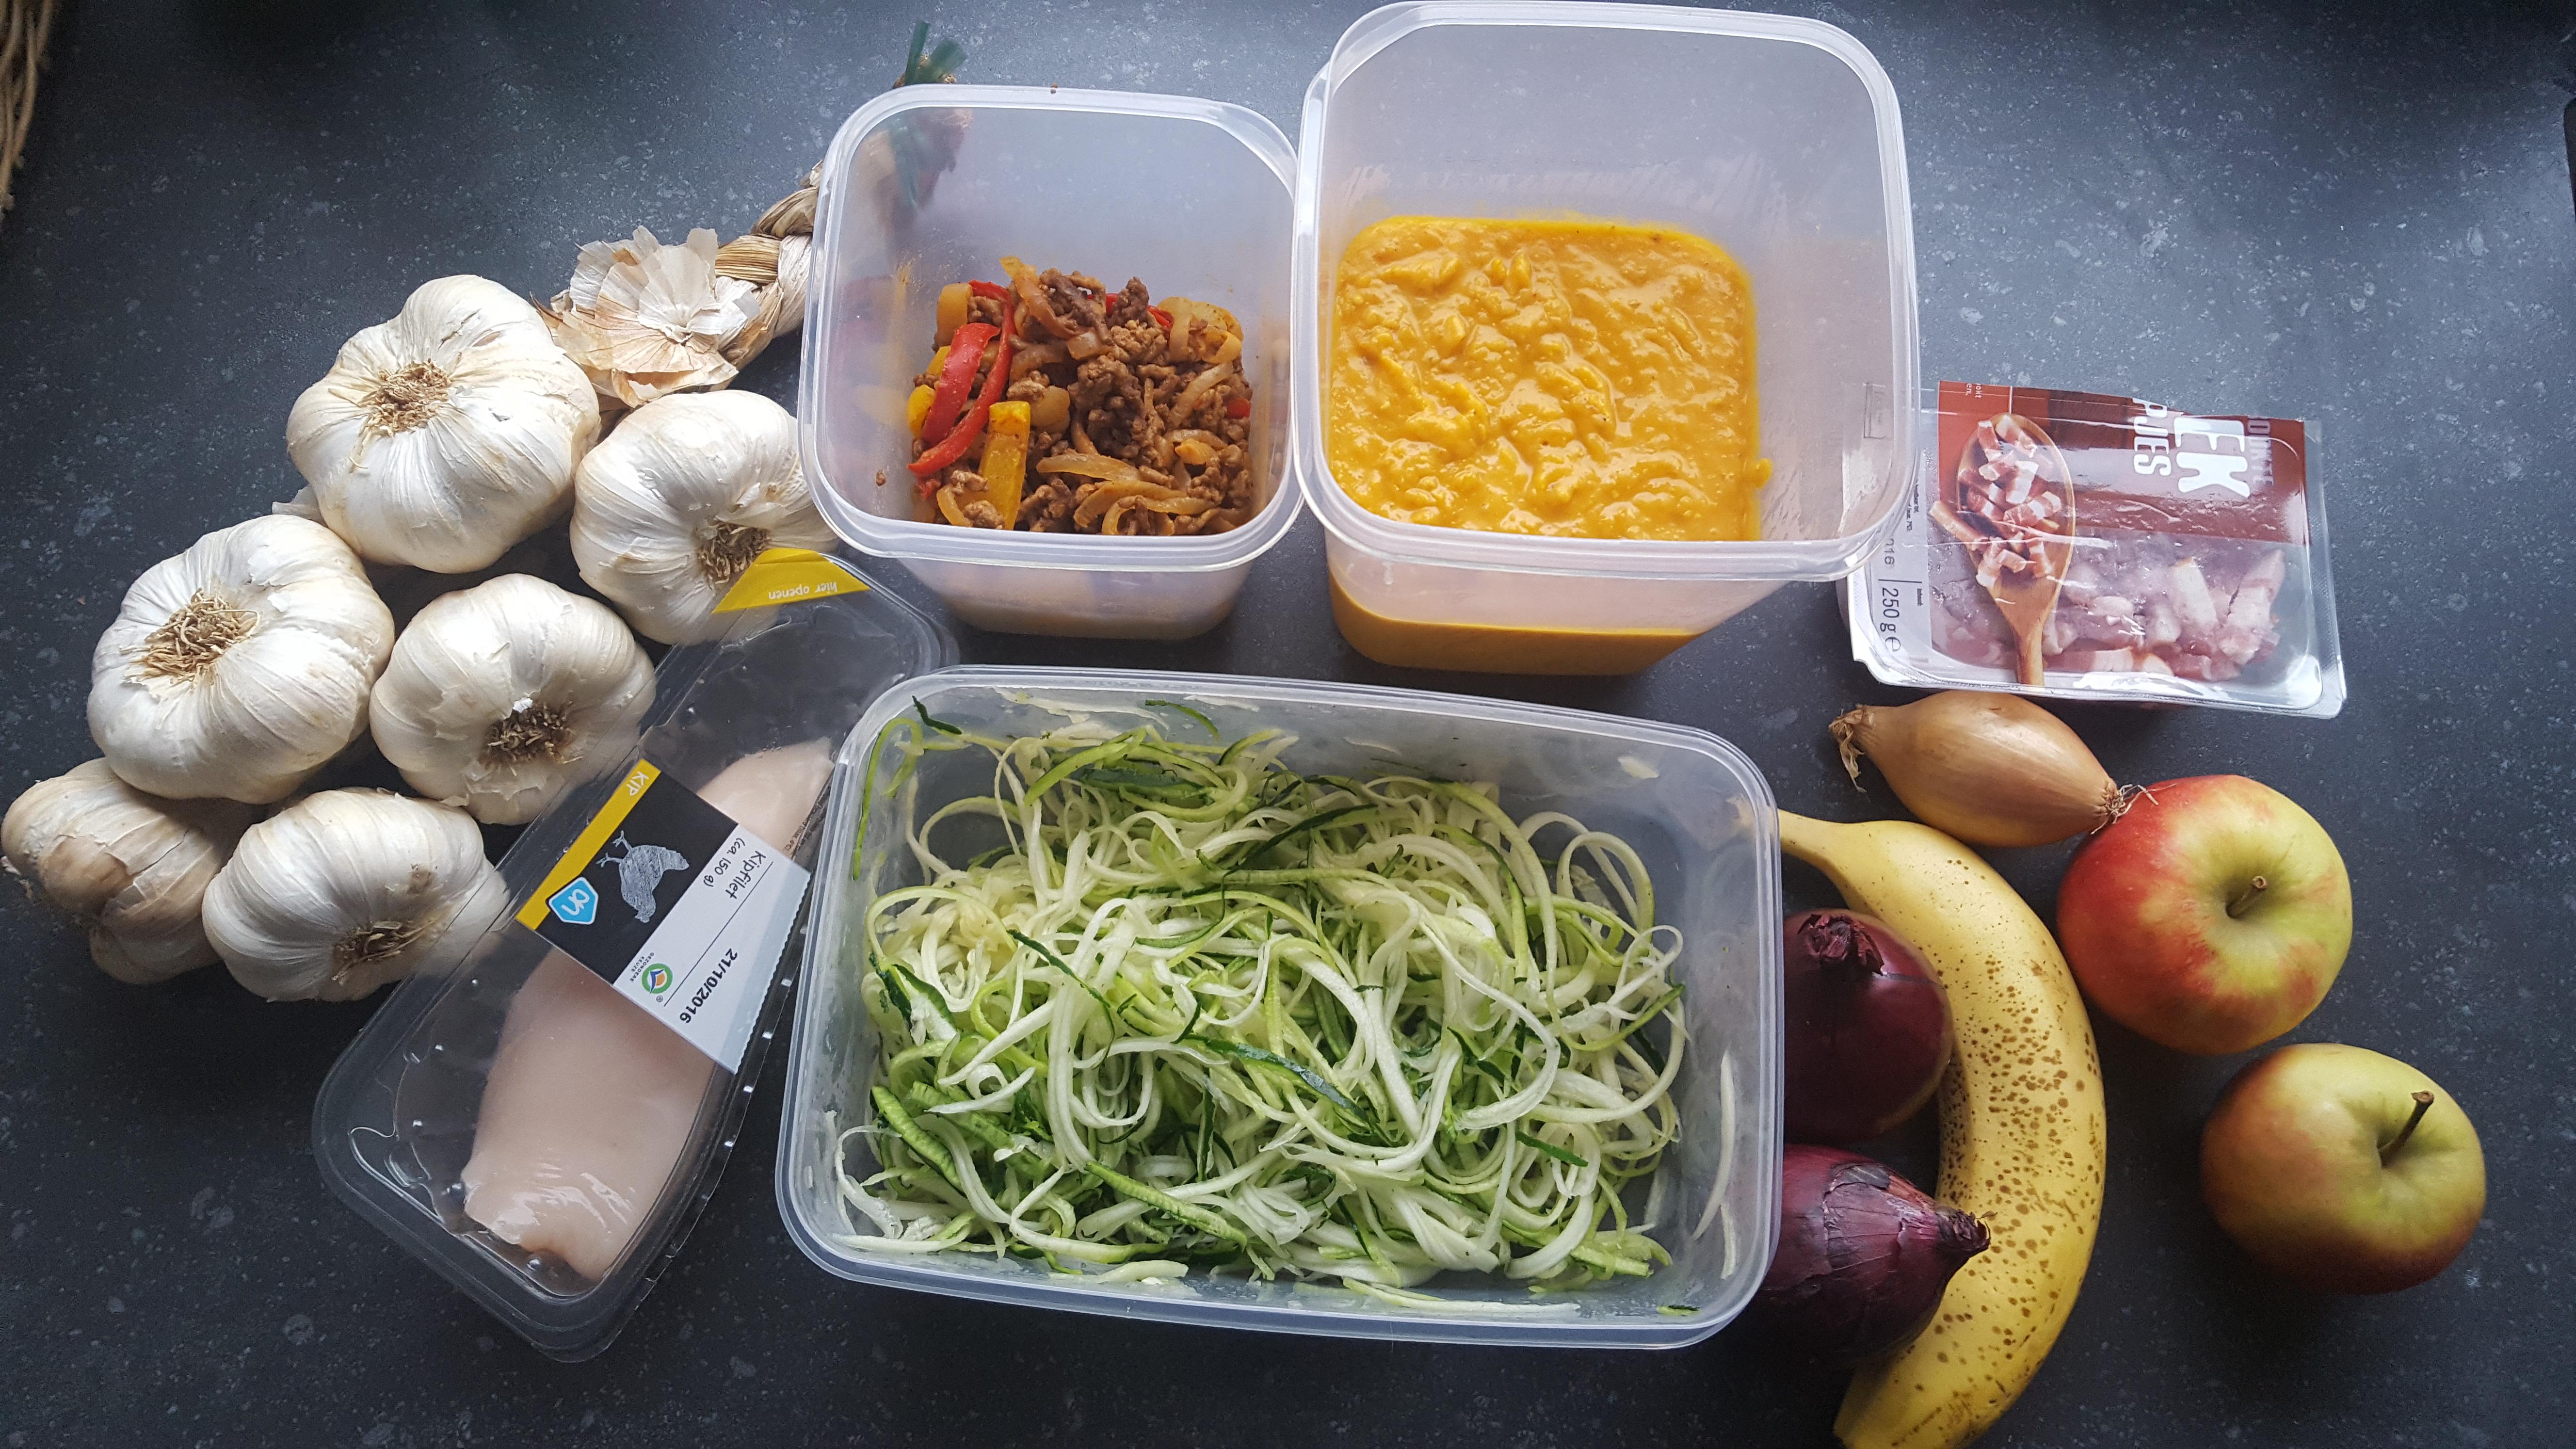 voedselverspilling tegen gaan tips burgertrutjes